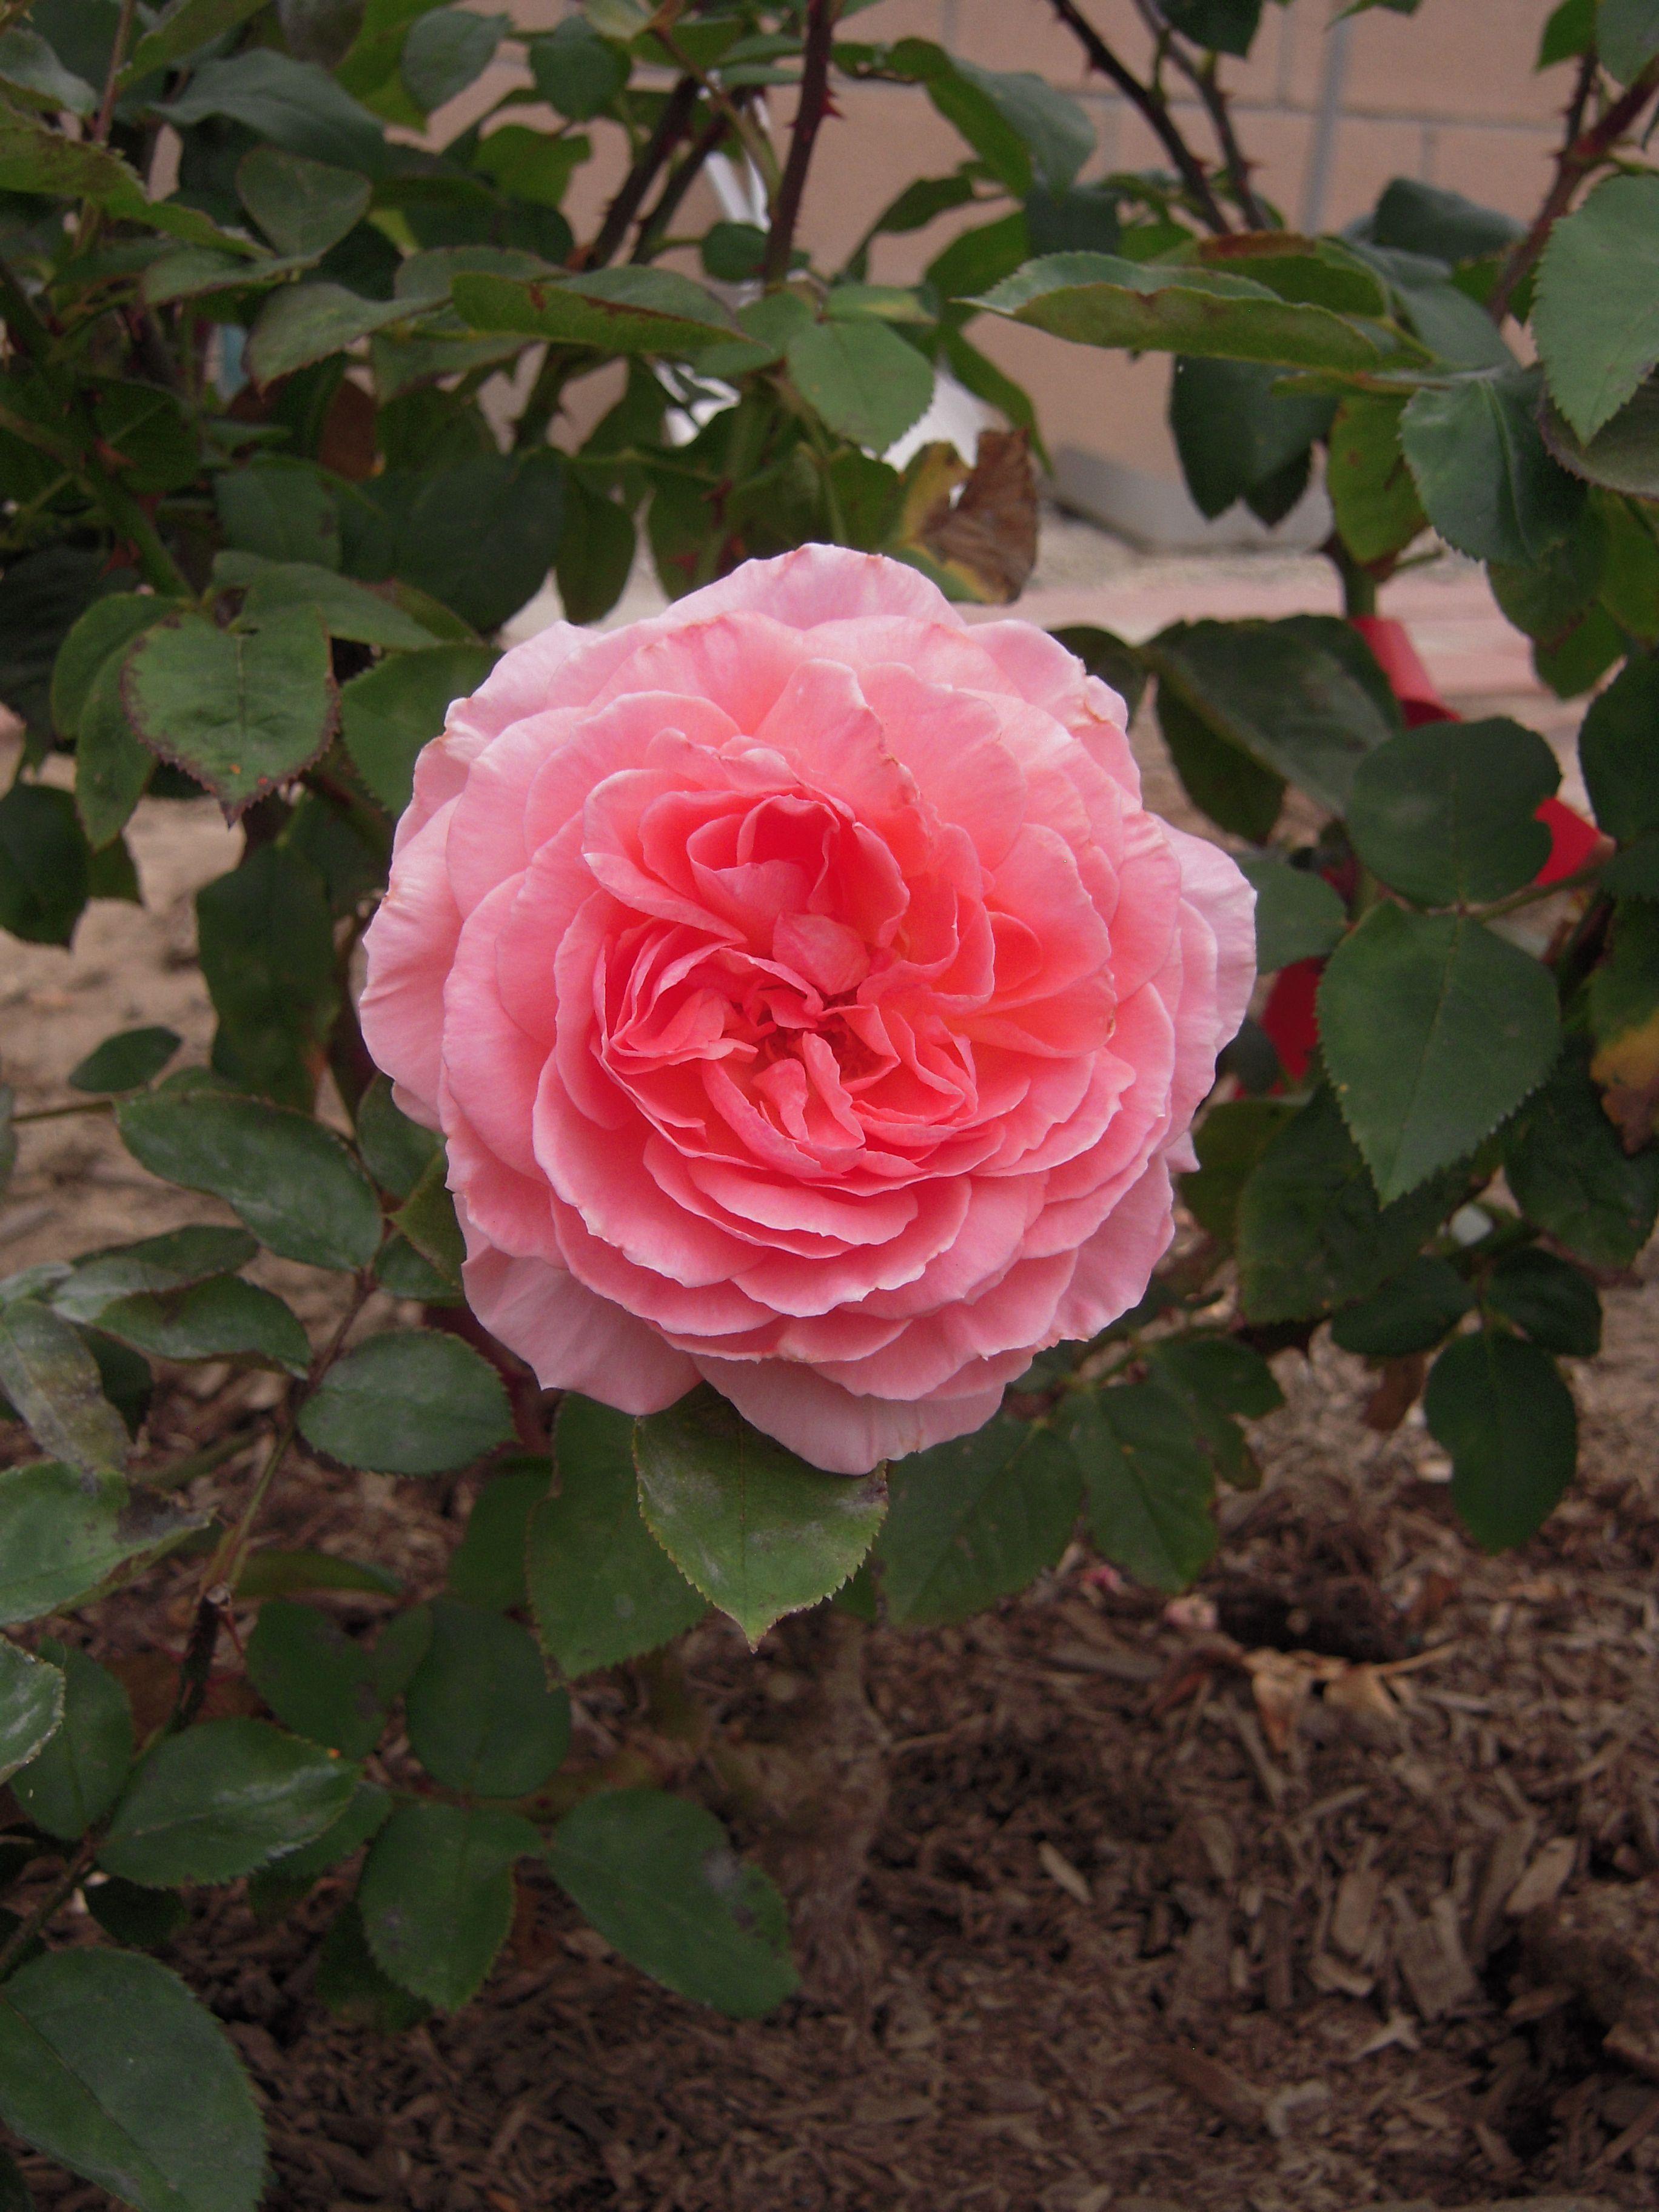 My New Rose Bush Liv Tyler Hybrid Tea Romantica You Can See More Photos On My Blog Here Http Whyilovetogarden Blogspot Hybrid Tea Roses Rose Tea Roses